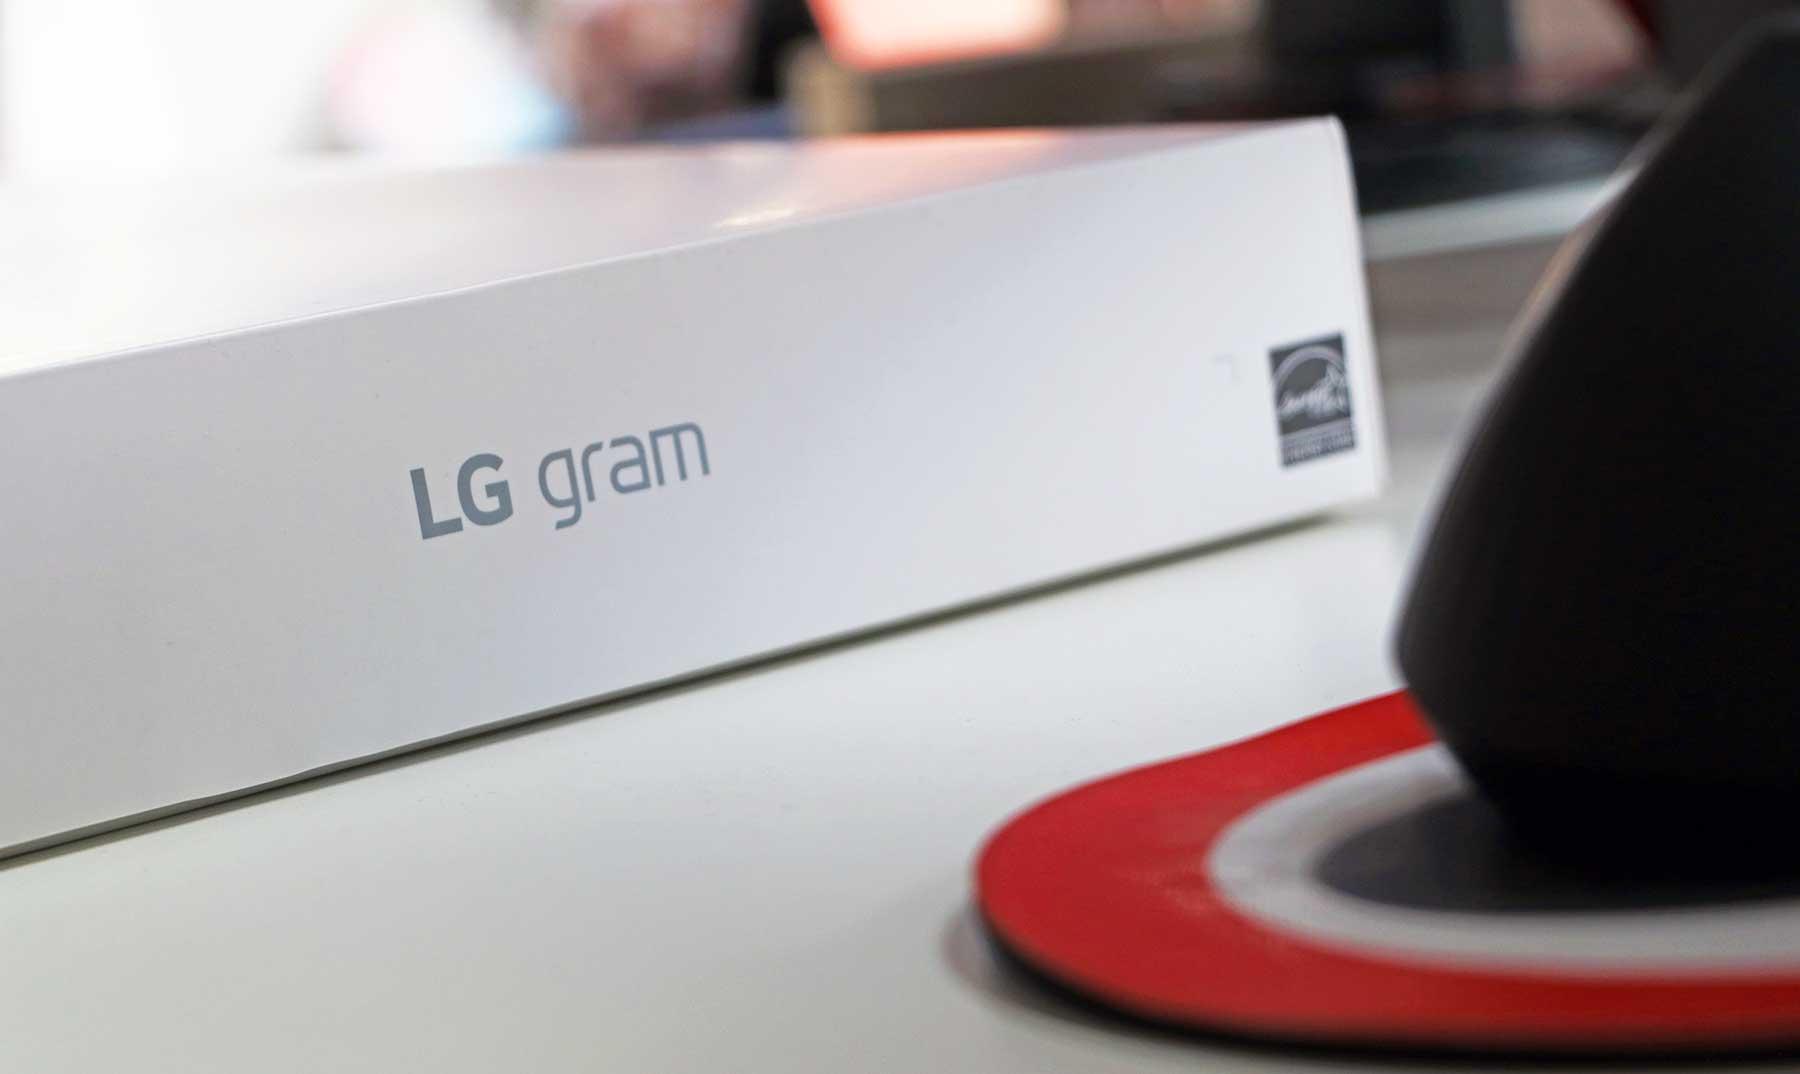 Laptop-Testbericht: Neues LG gram 17-Zoll-Notebook (2021er Version) LG-gram-17_2021_Testbericht_02